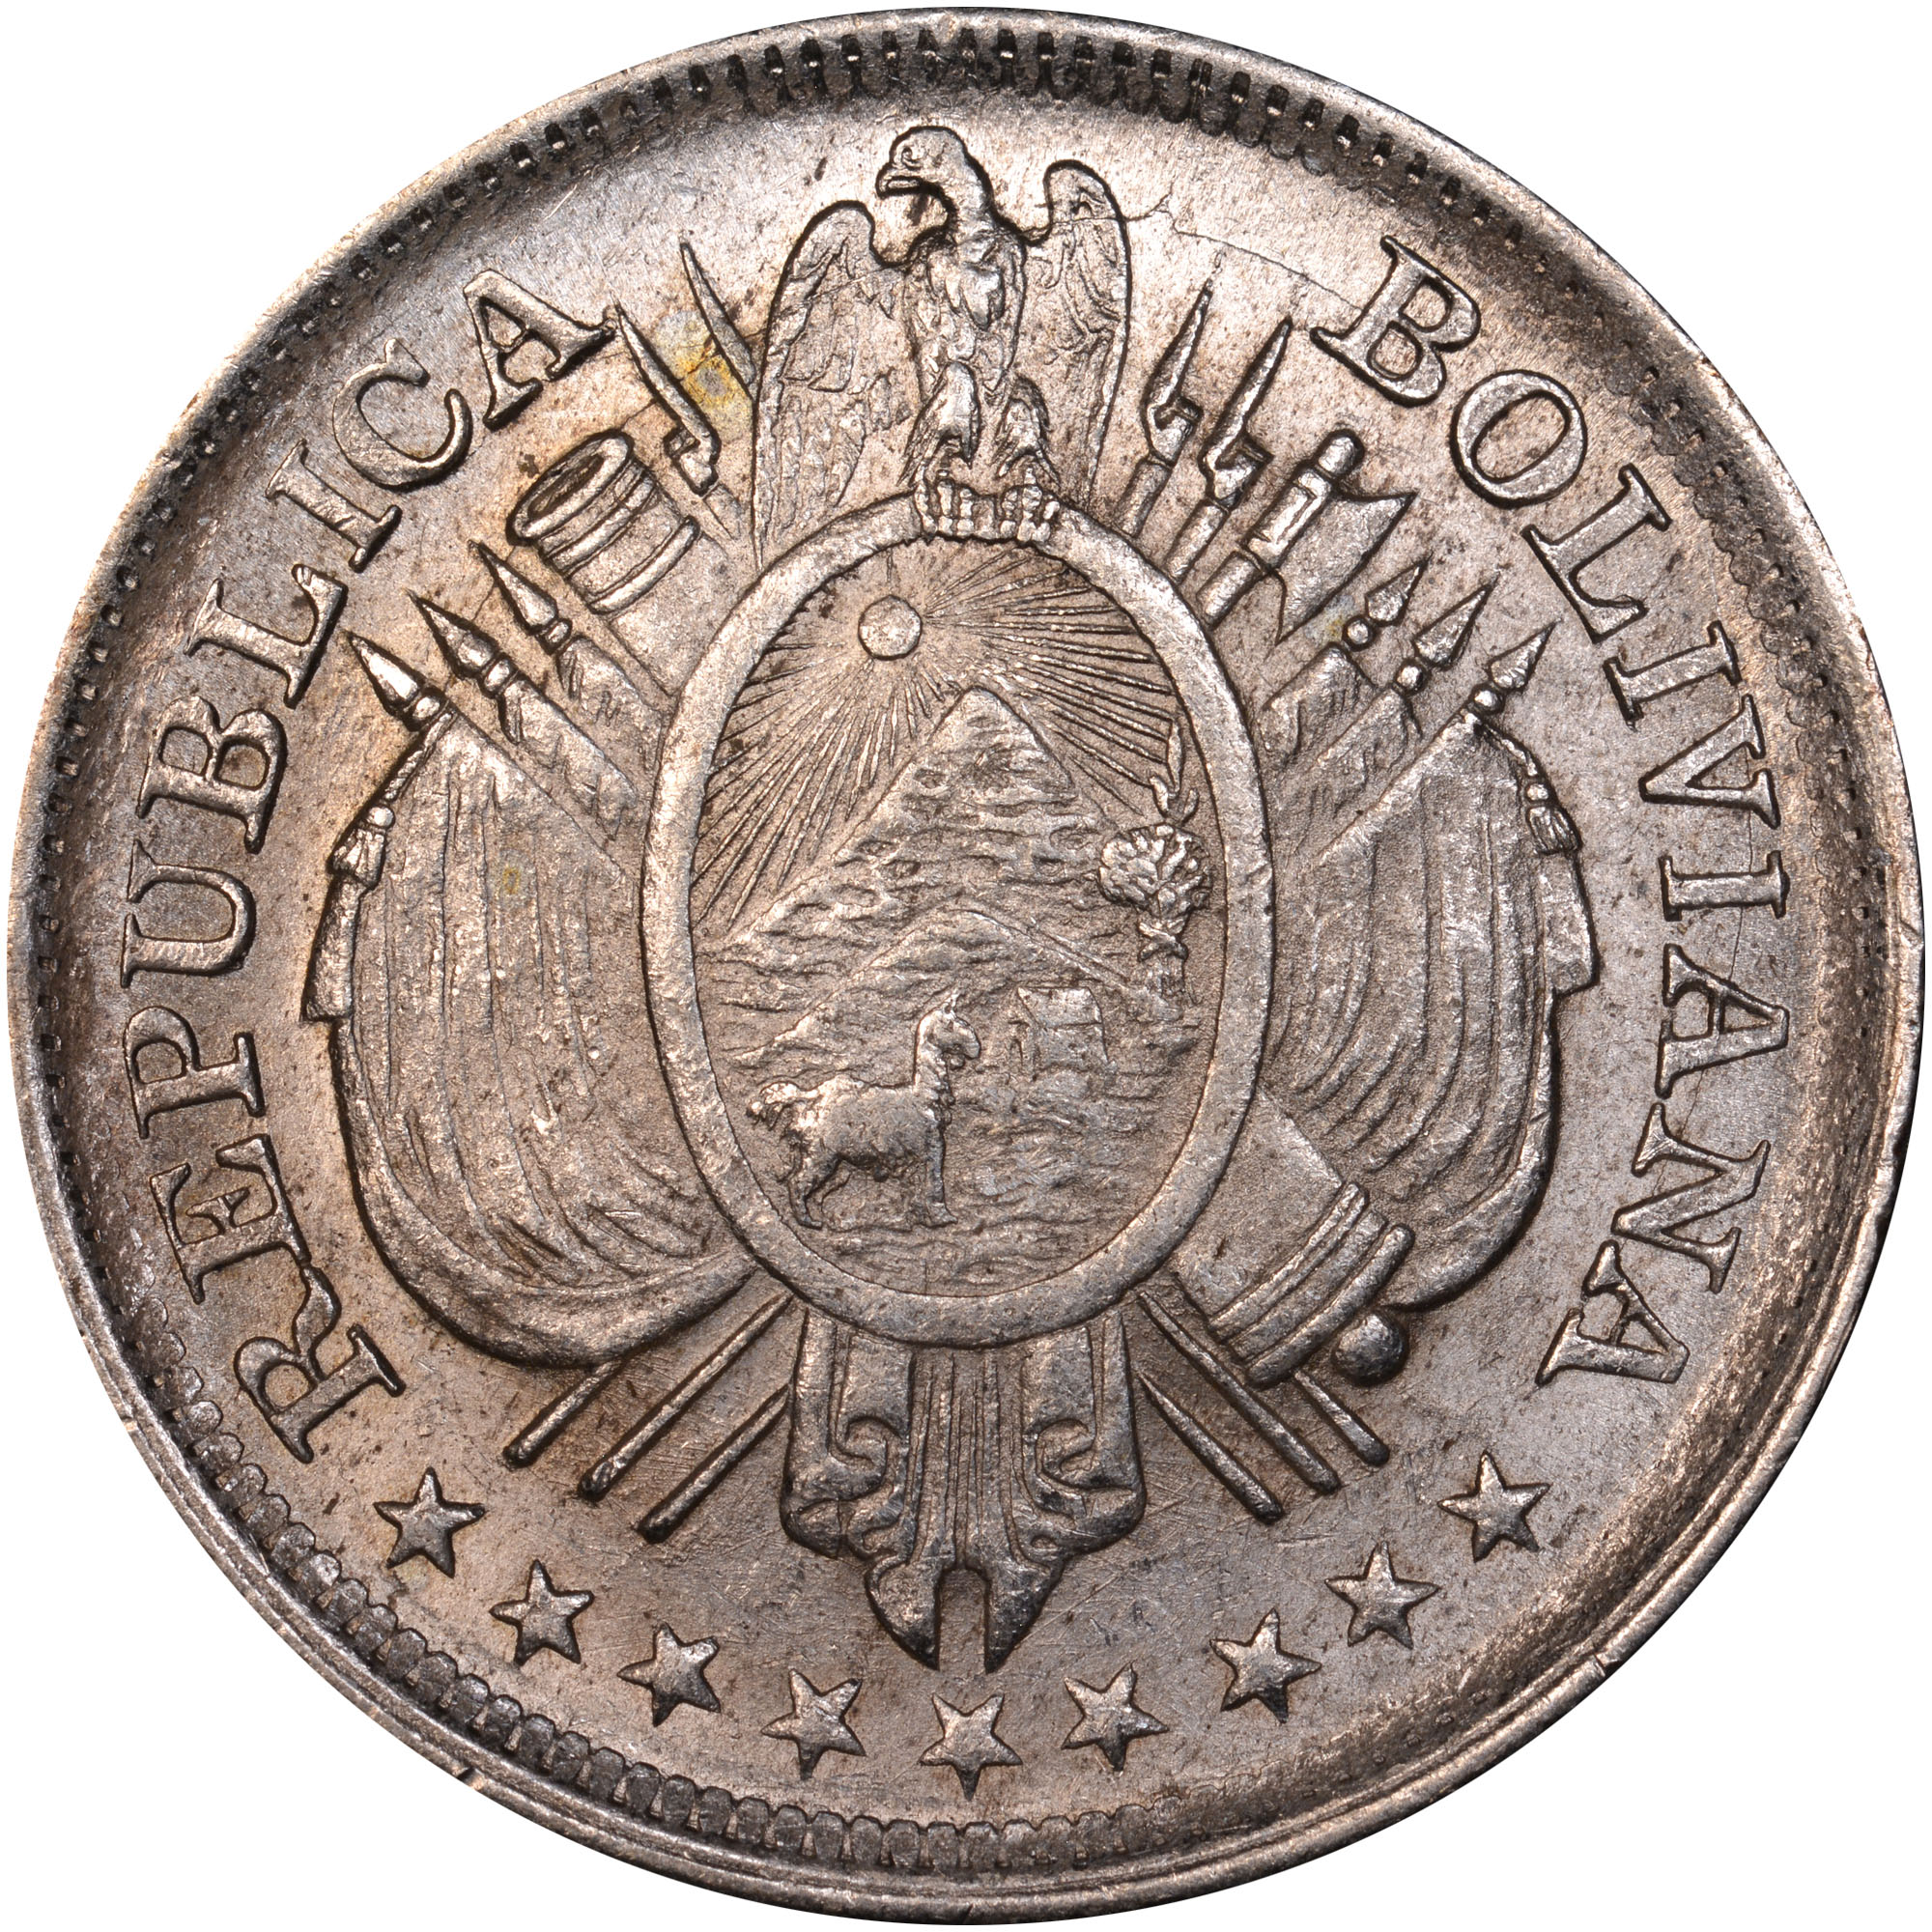 1891-1900 Bolivia 50 Centavos, 1/2 Boliviano obverse